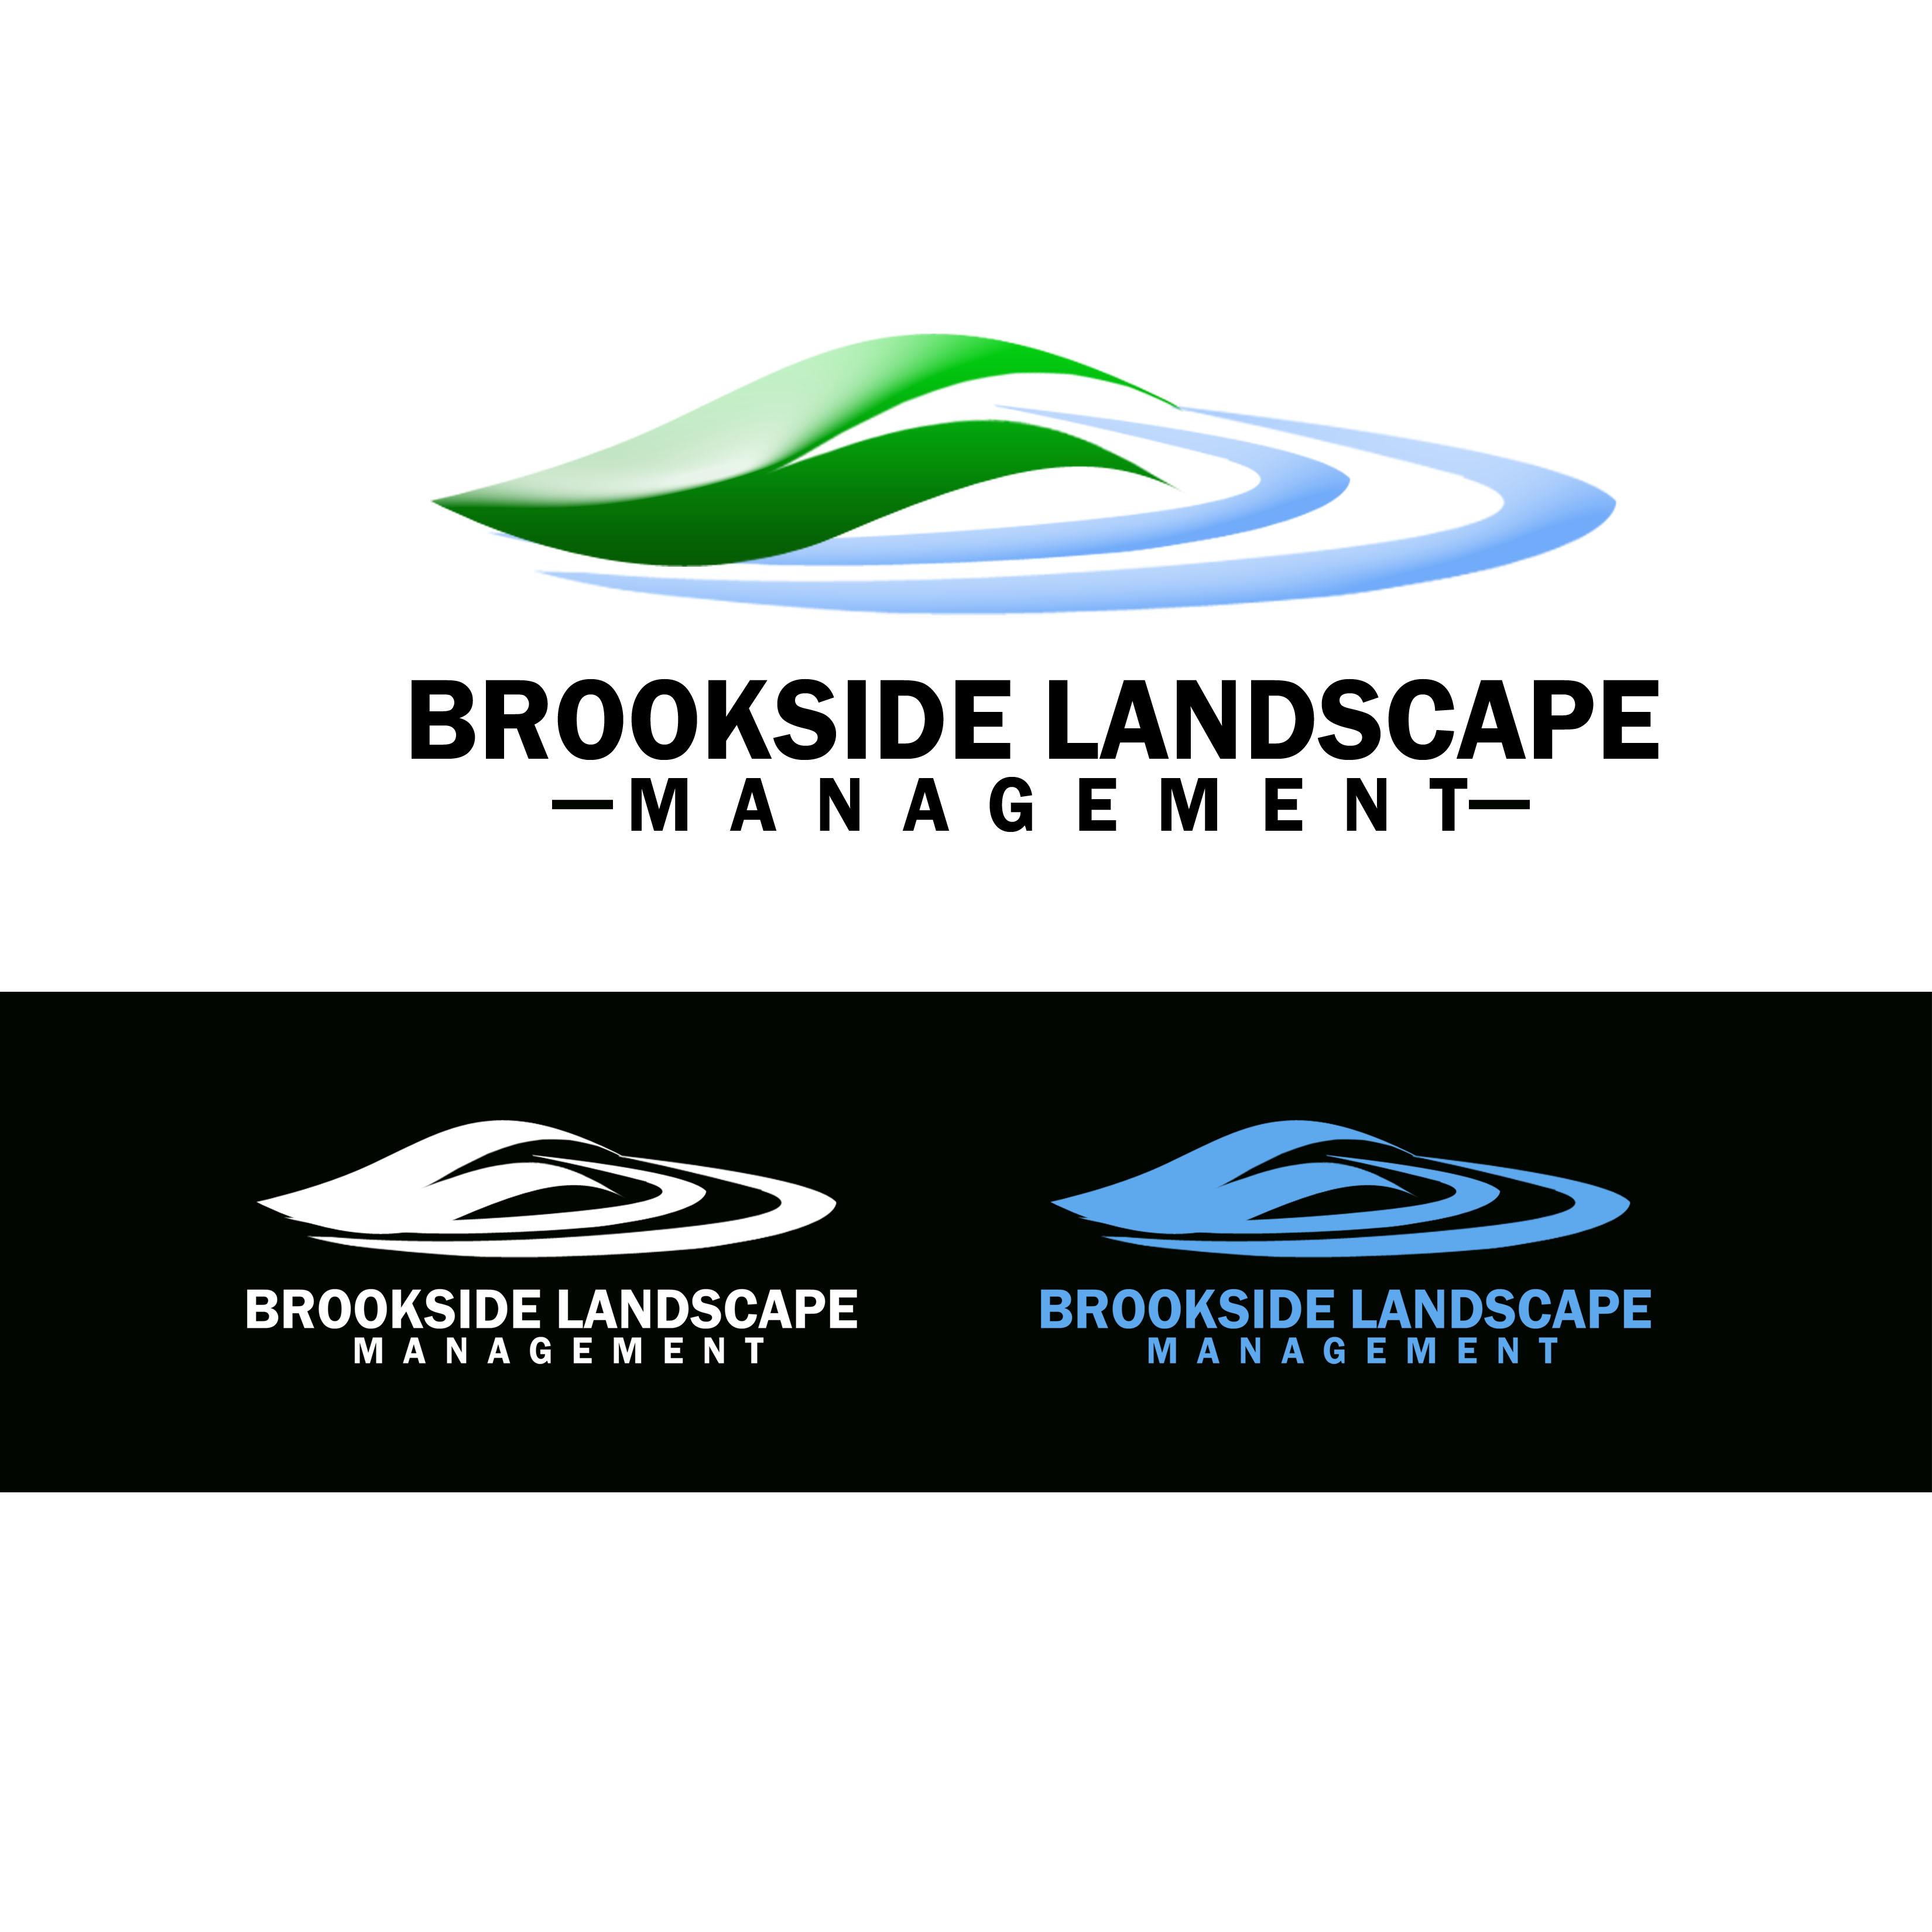 Logo Design by Allan Esclamado - Entry No. 24 in the Logo Design Contest New Logo Design for Brookside Landscape Management.